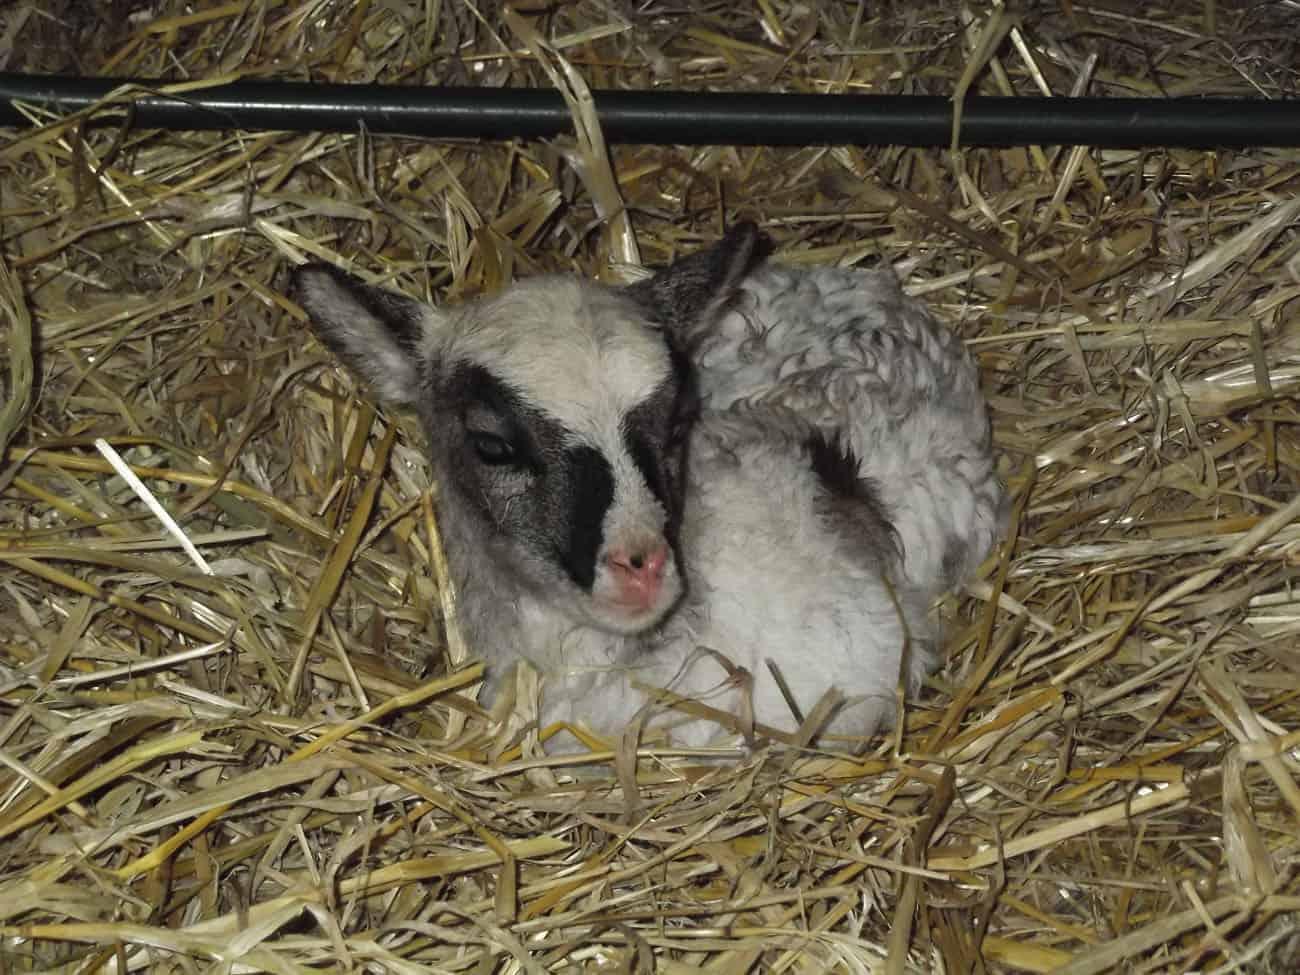 patchwork sheep newborn lamb soay cross shetland spotted ewe Fern